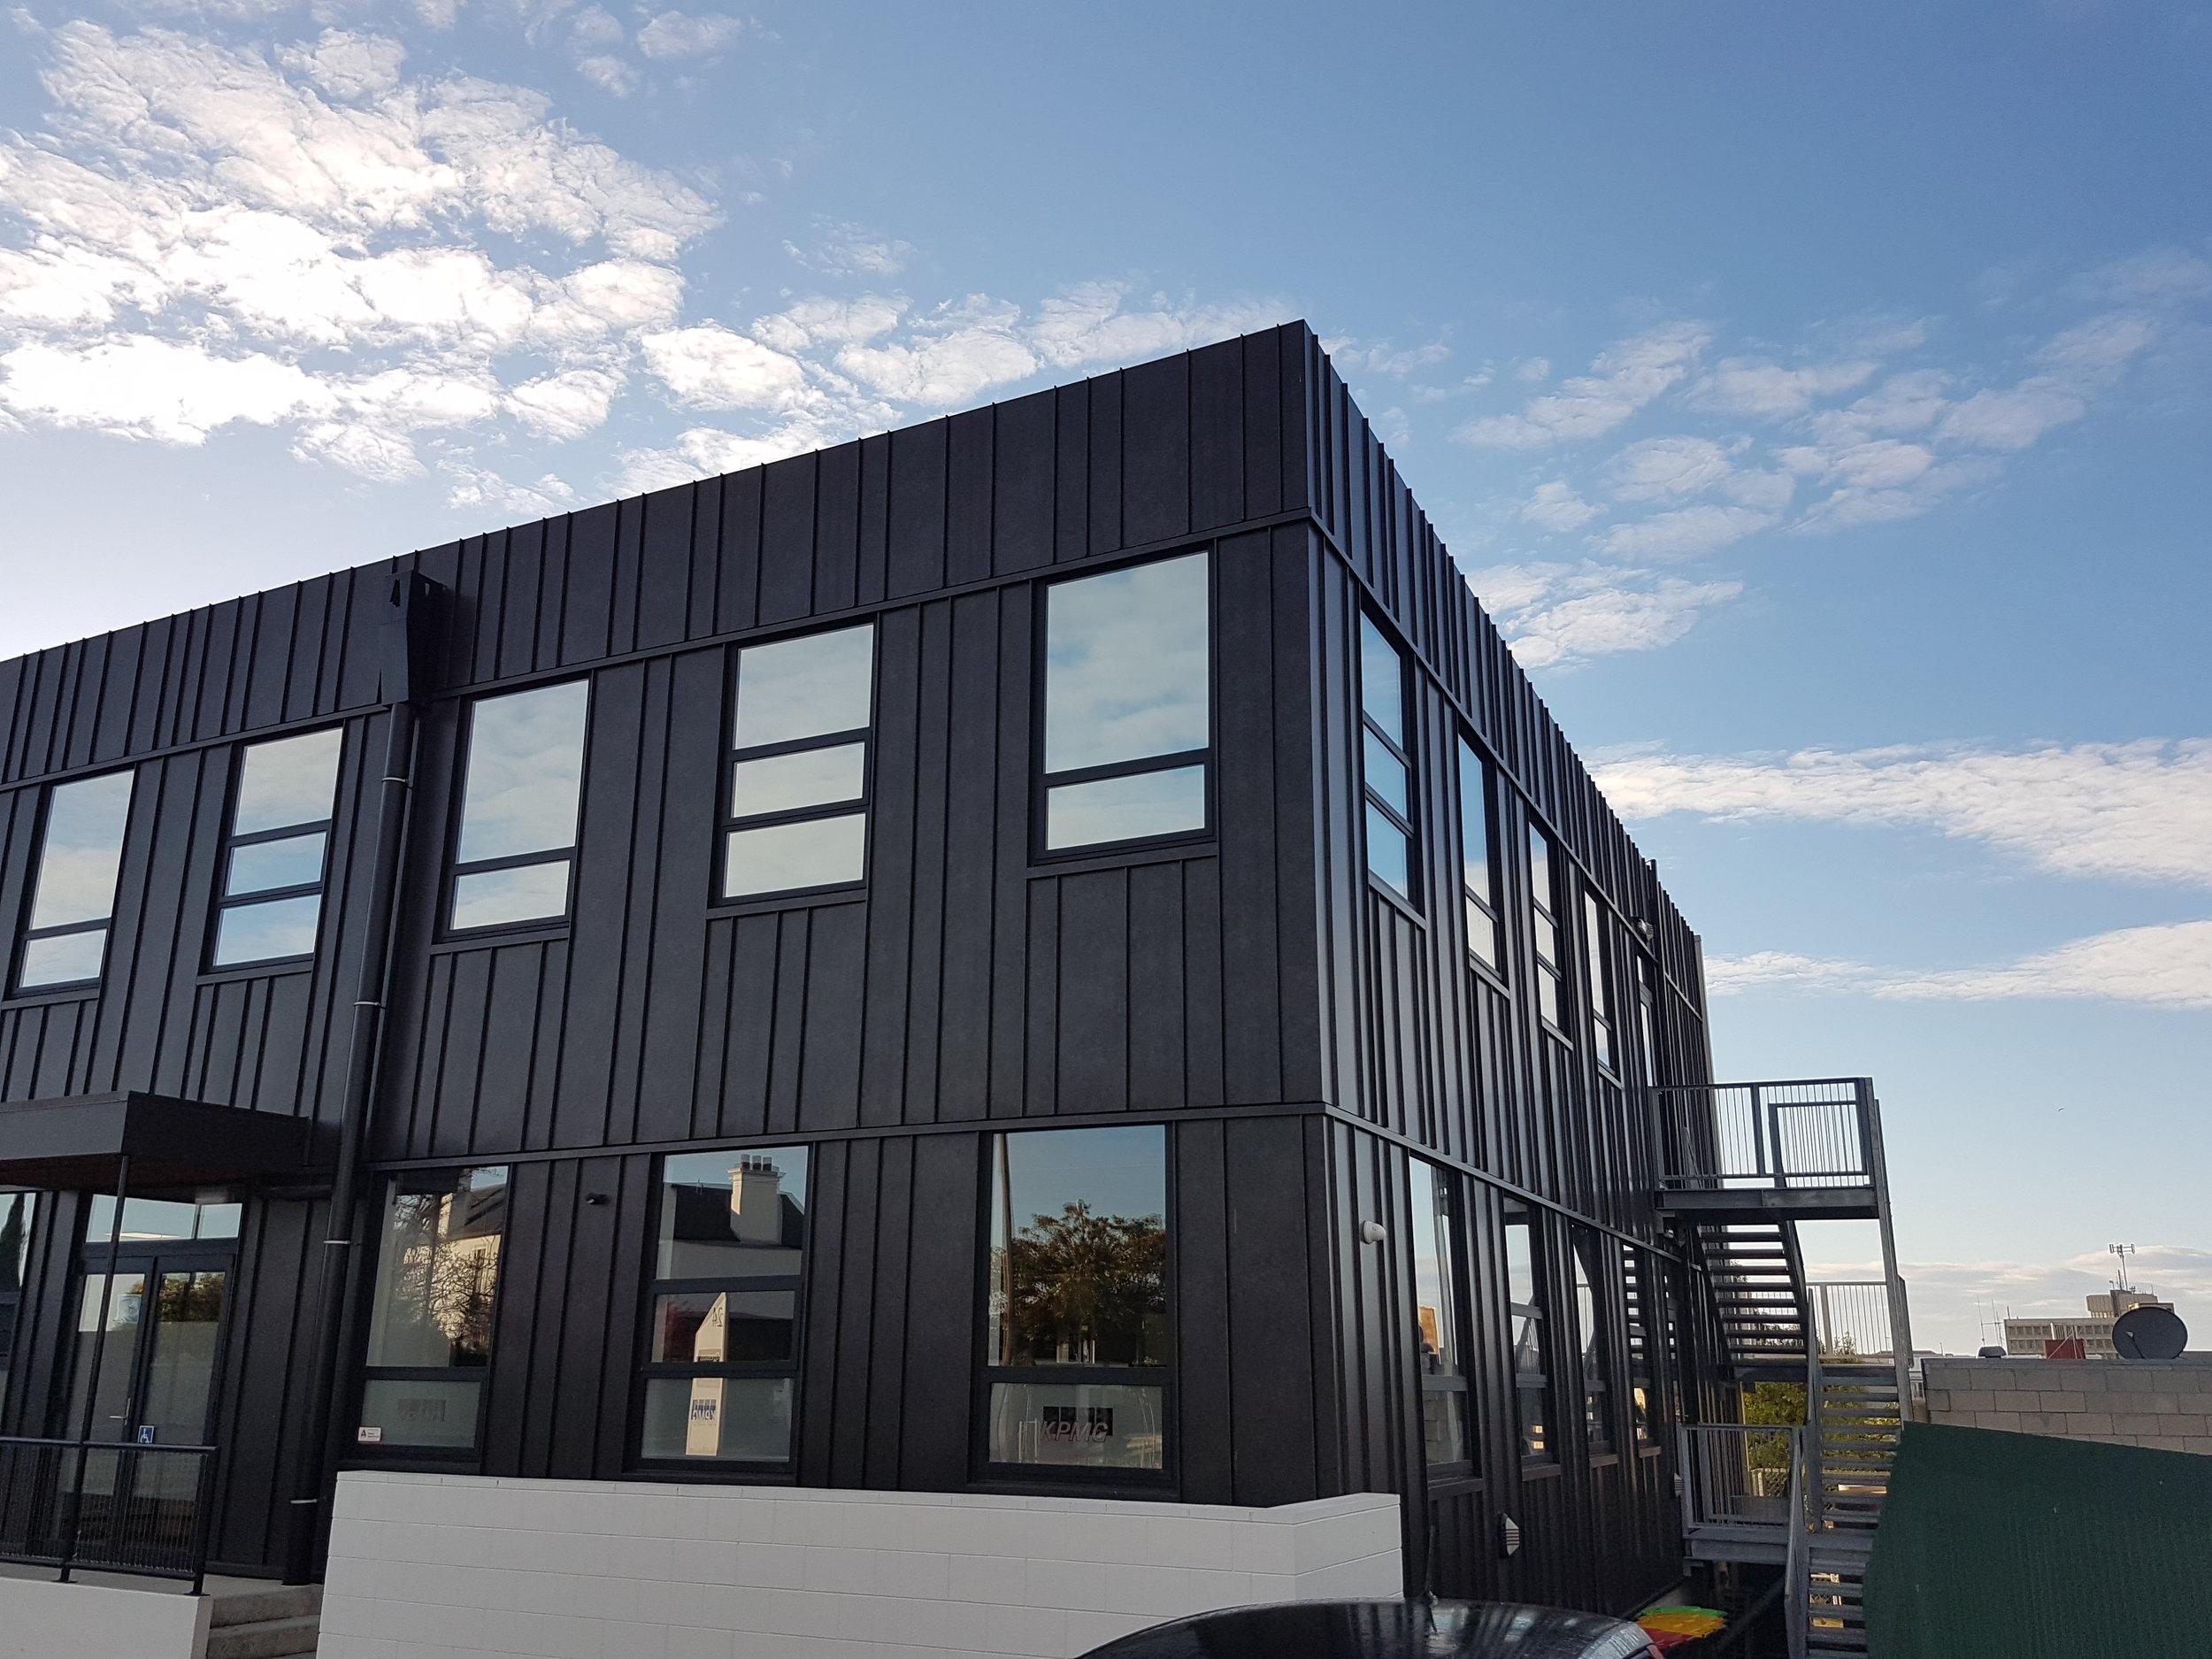 The-Roofing-Store-Steel-Metal-Standing-Seam-Lux-Dark-Corten-3.jpg.jpg